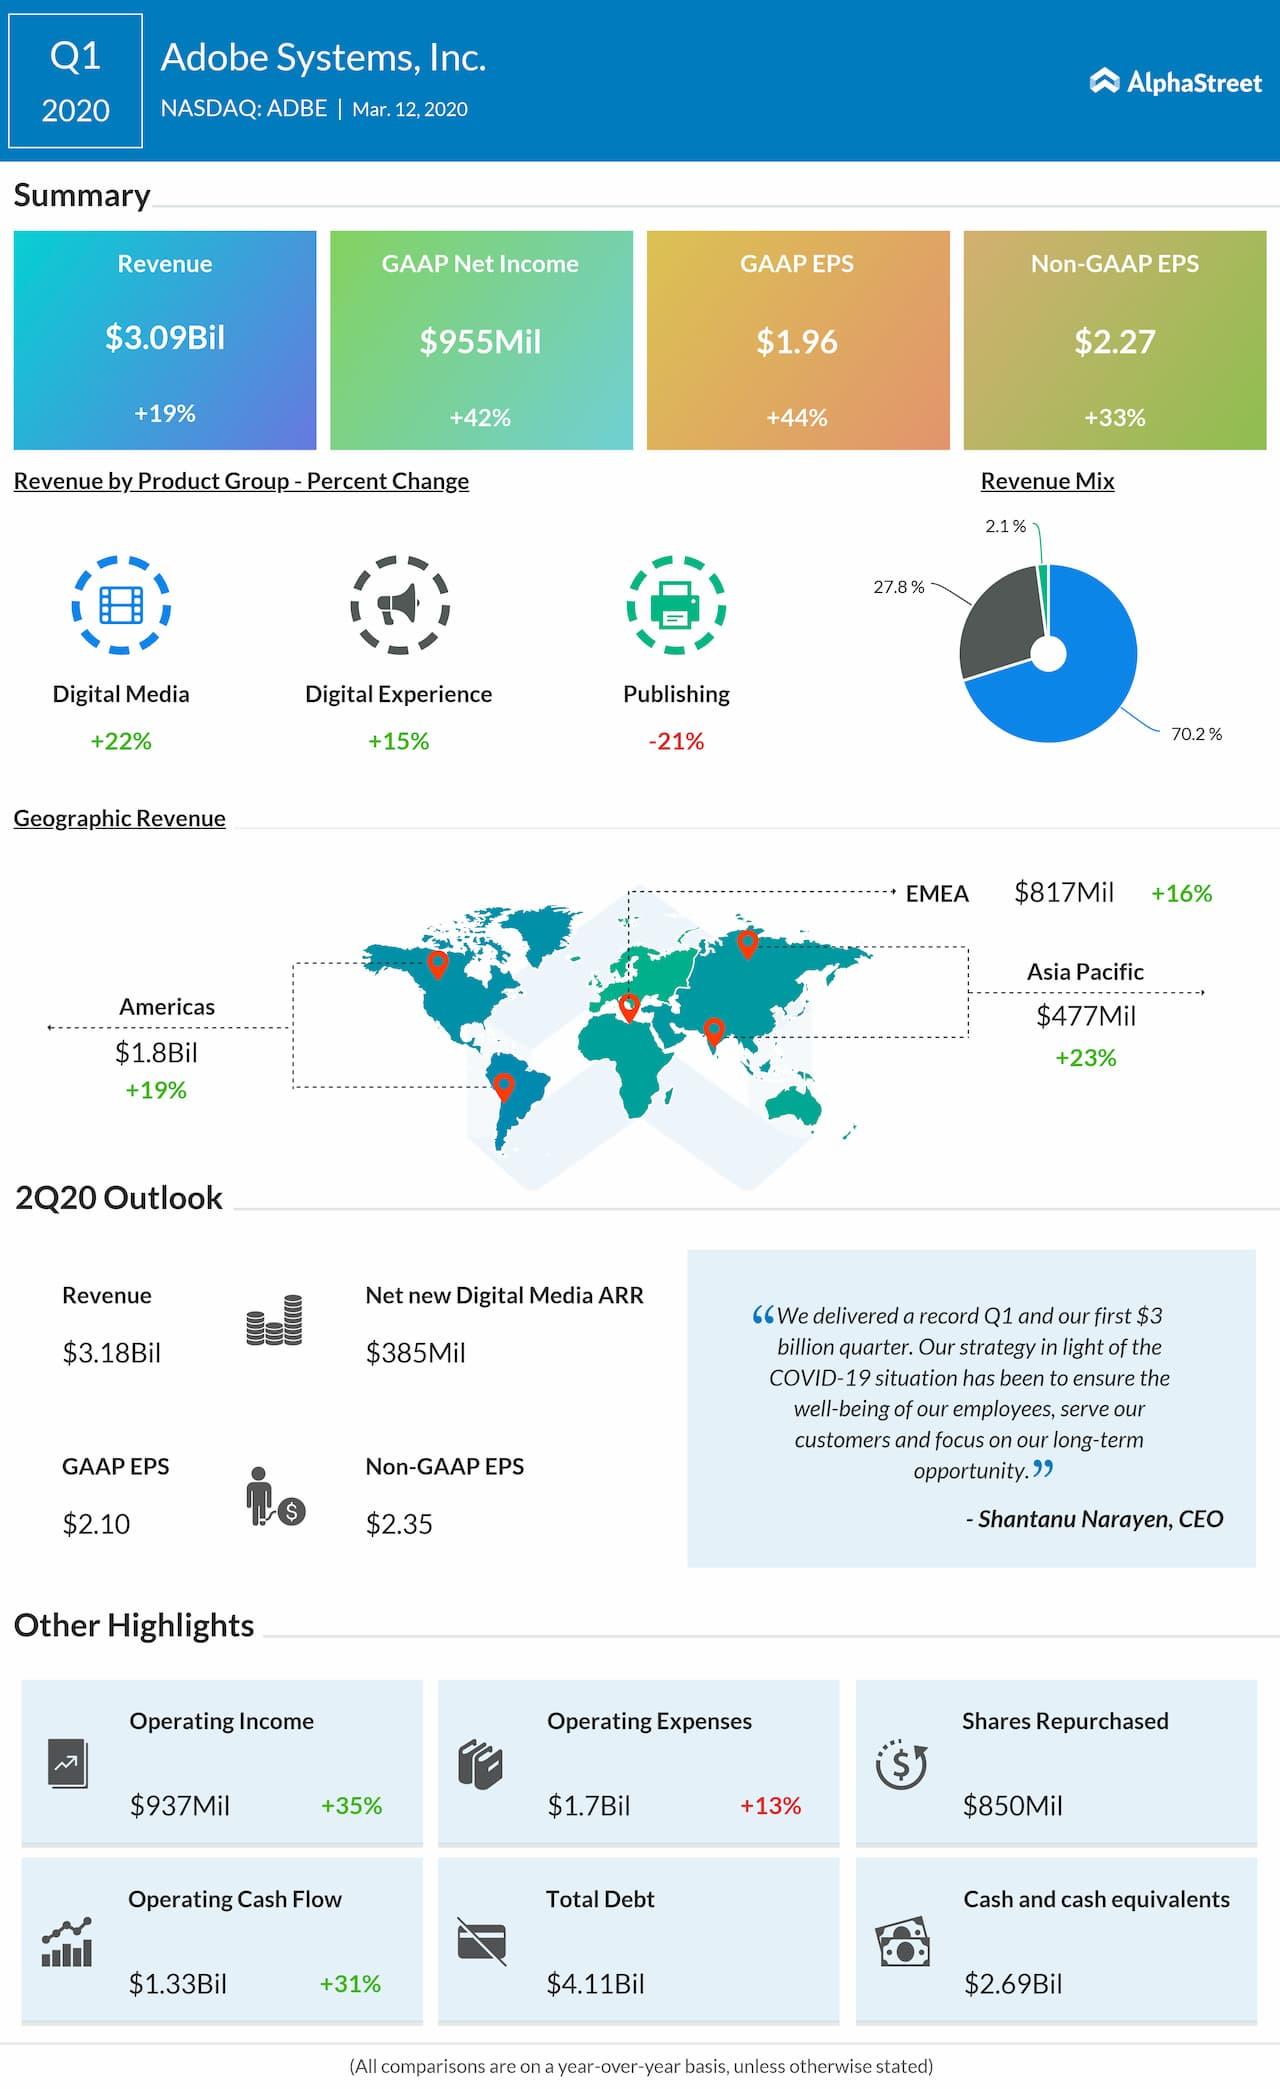 Adobe (ADBE) Q1 2020 earnings review